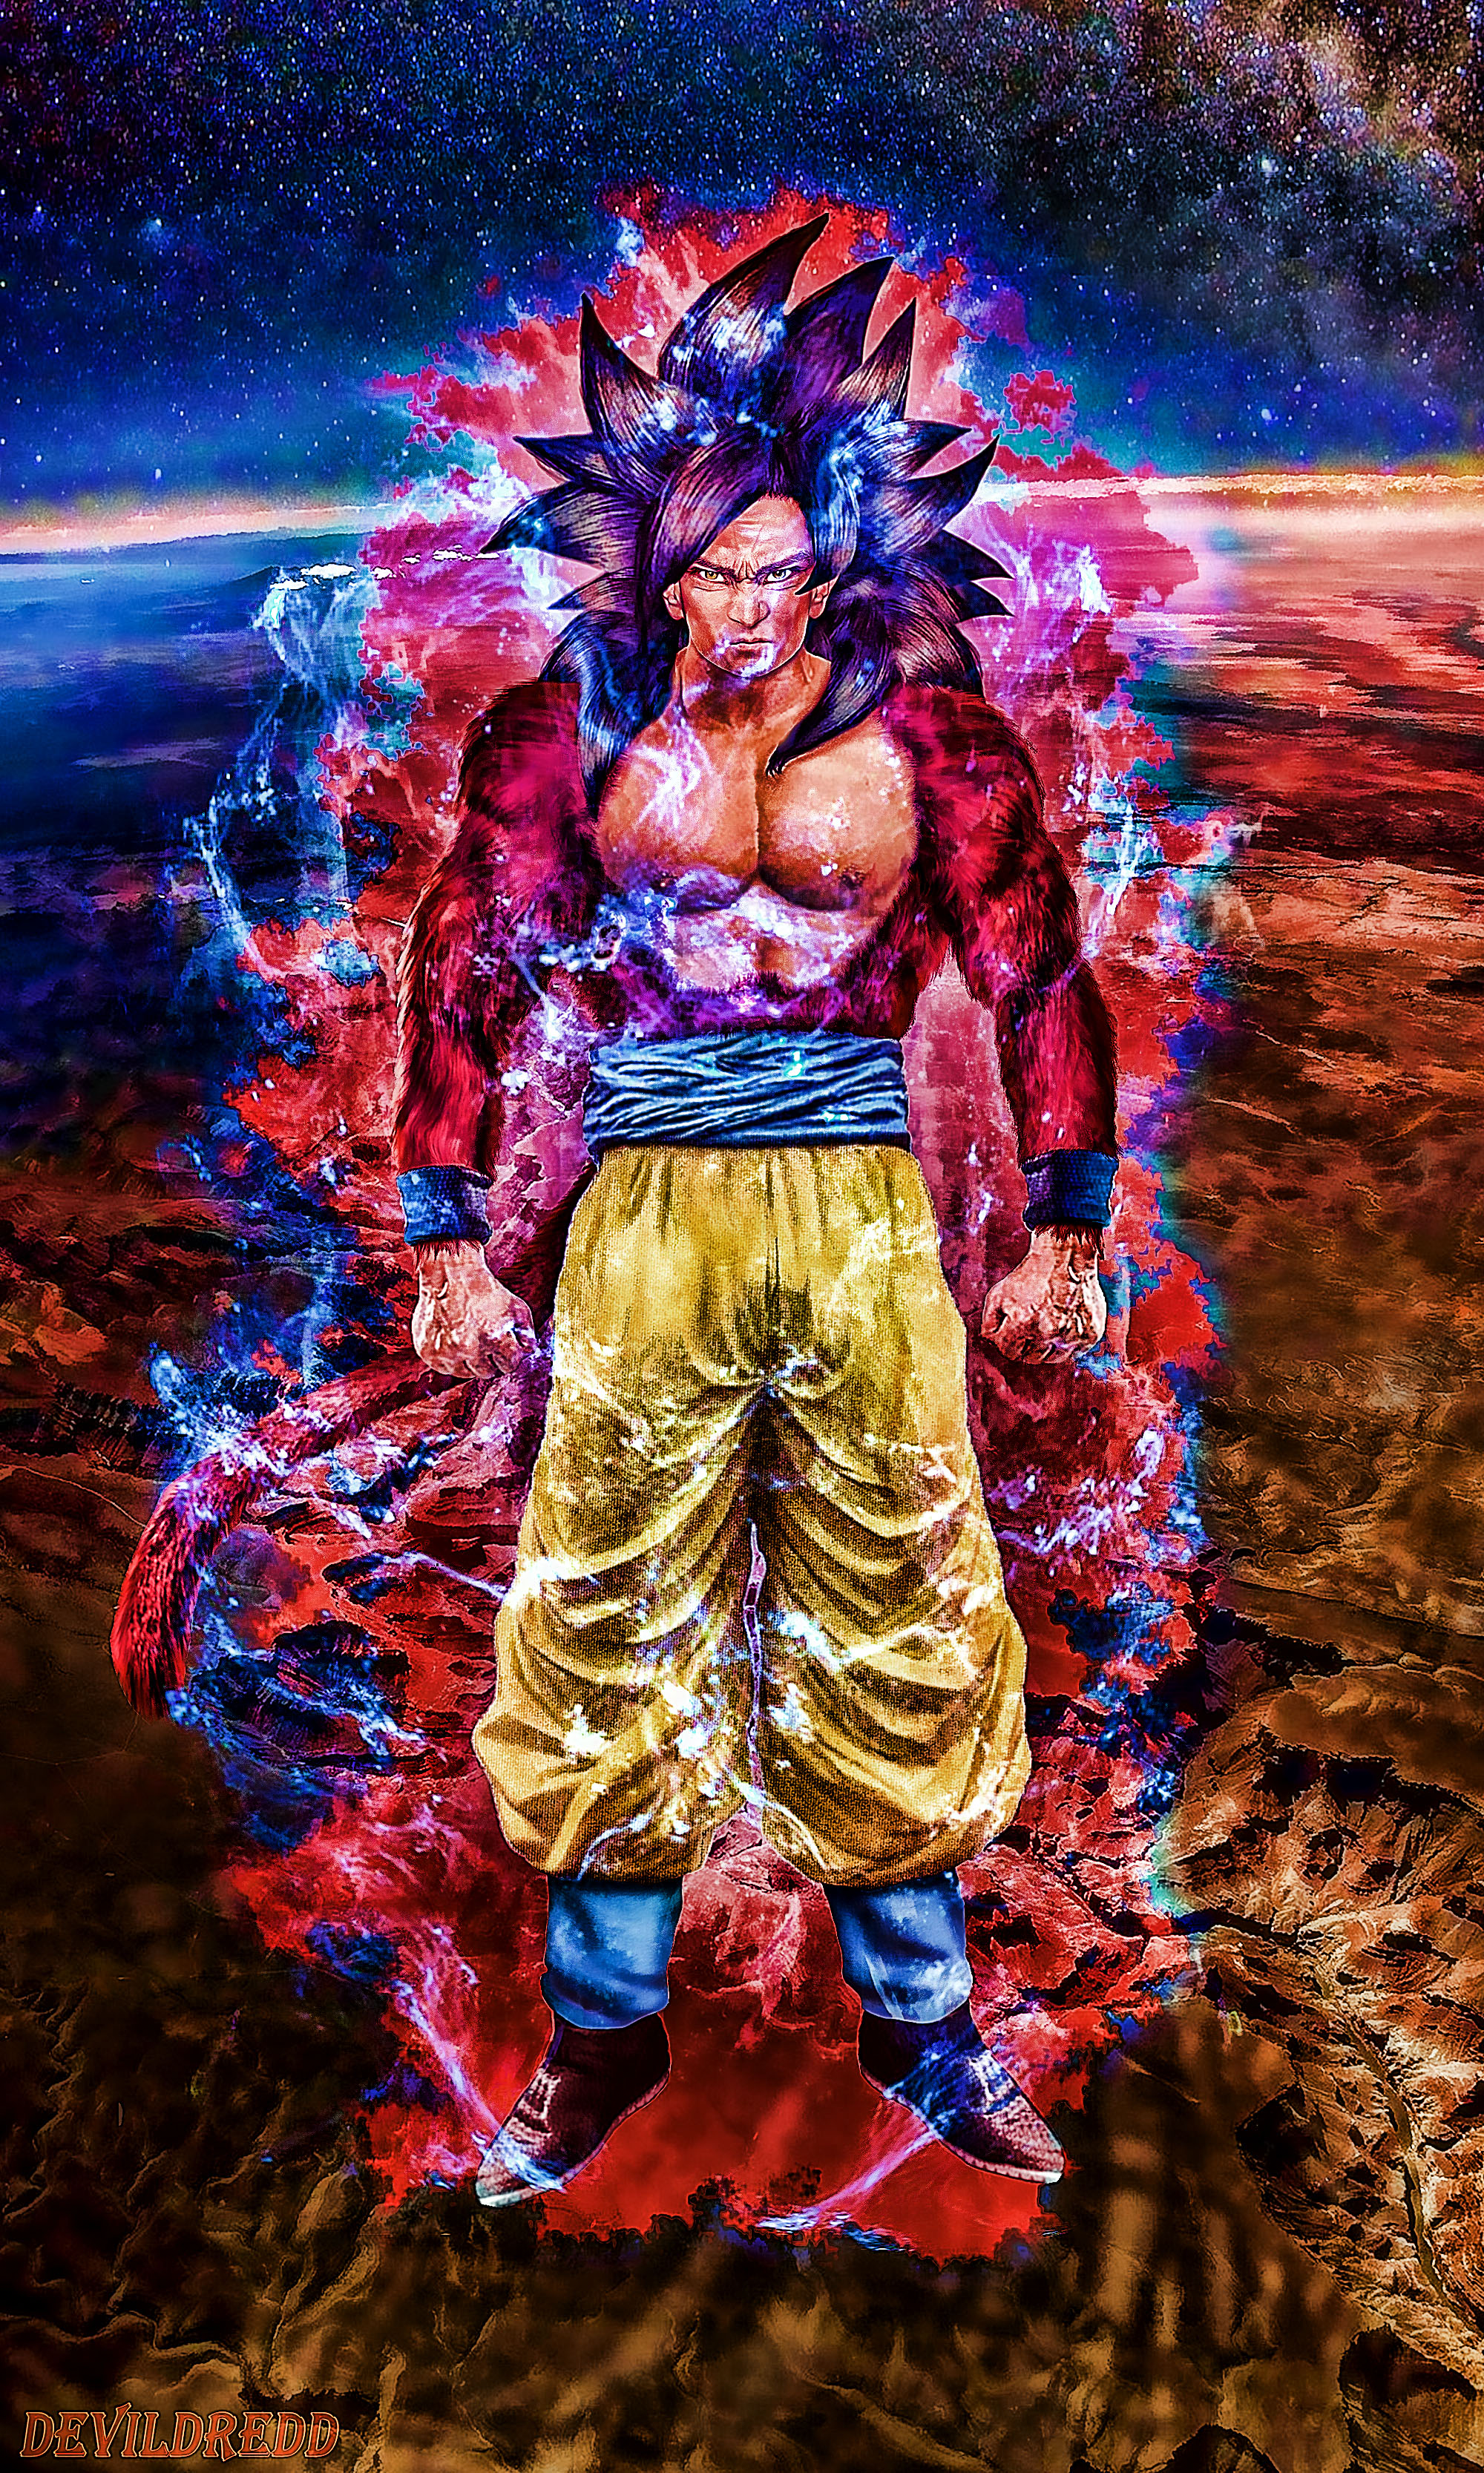 Goku Ssj4 by devildredd